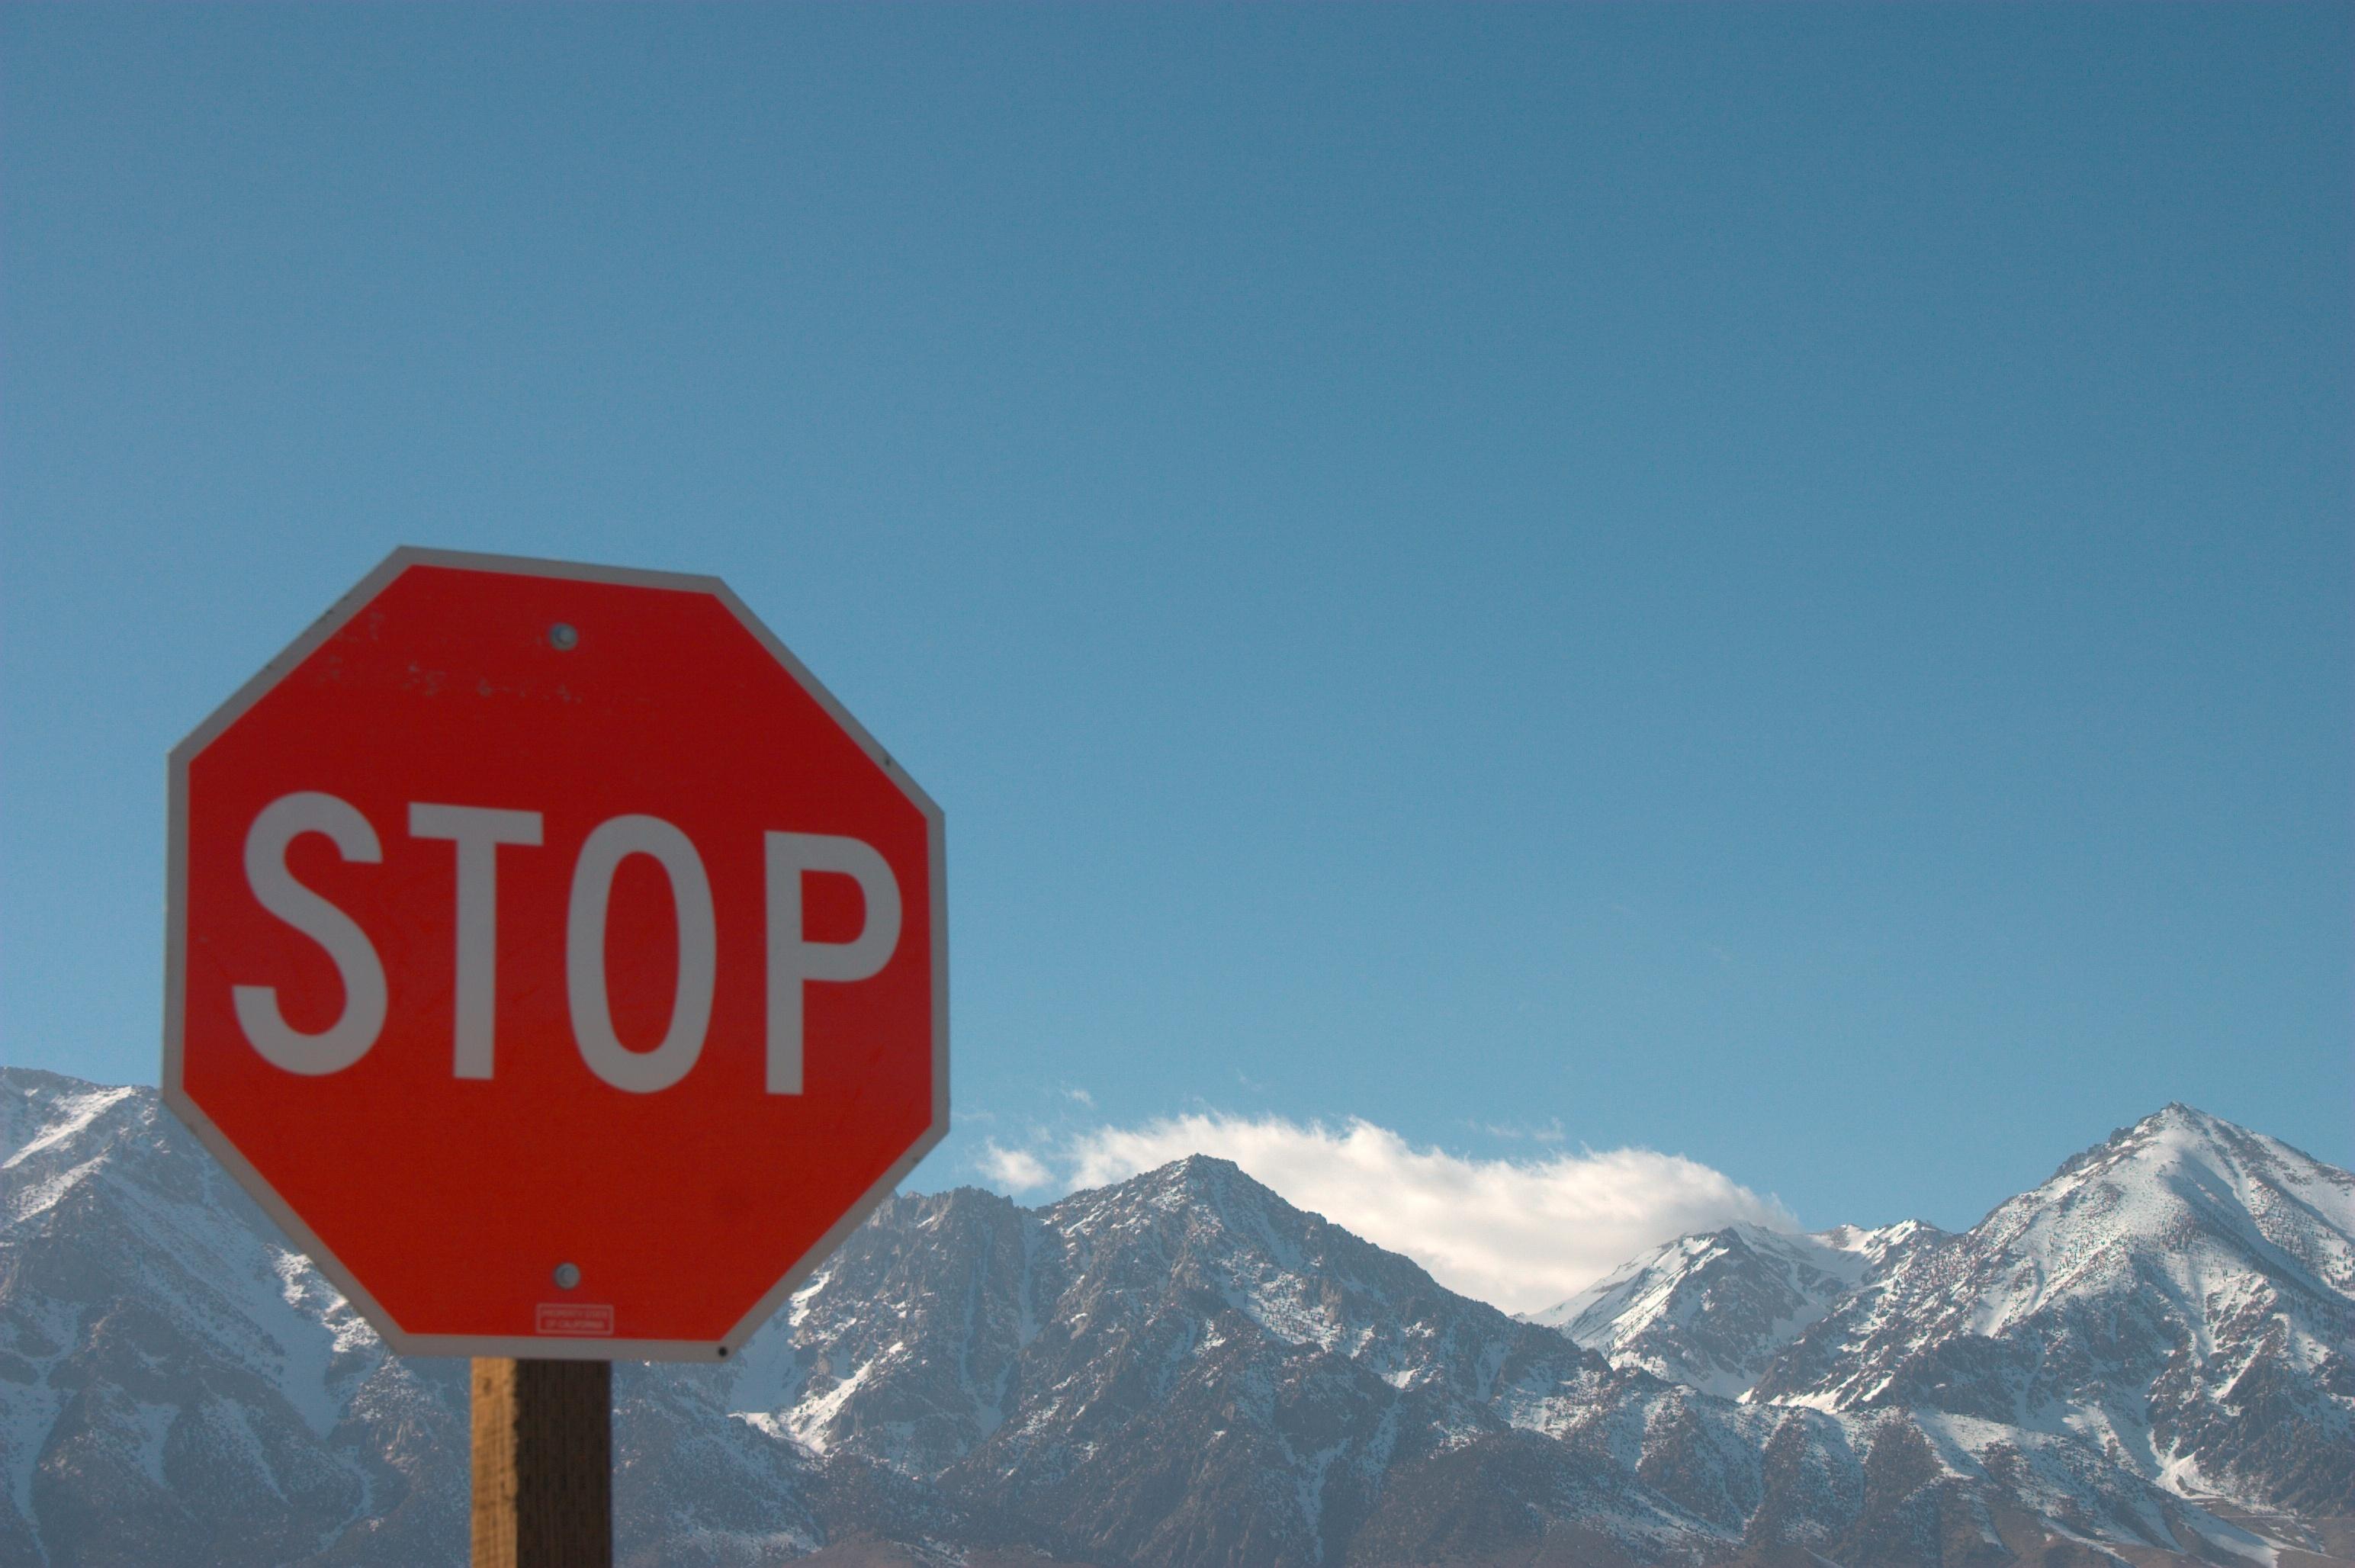 stop-image.jpg